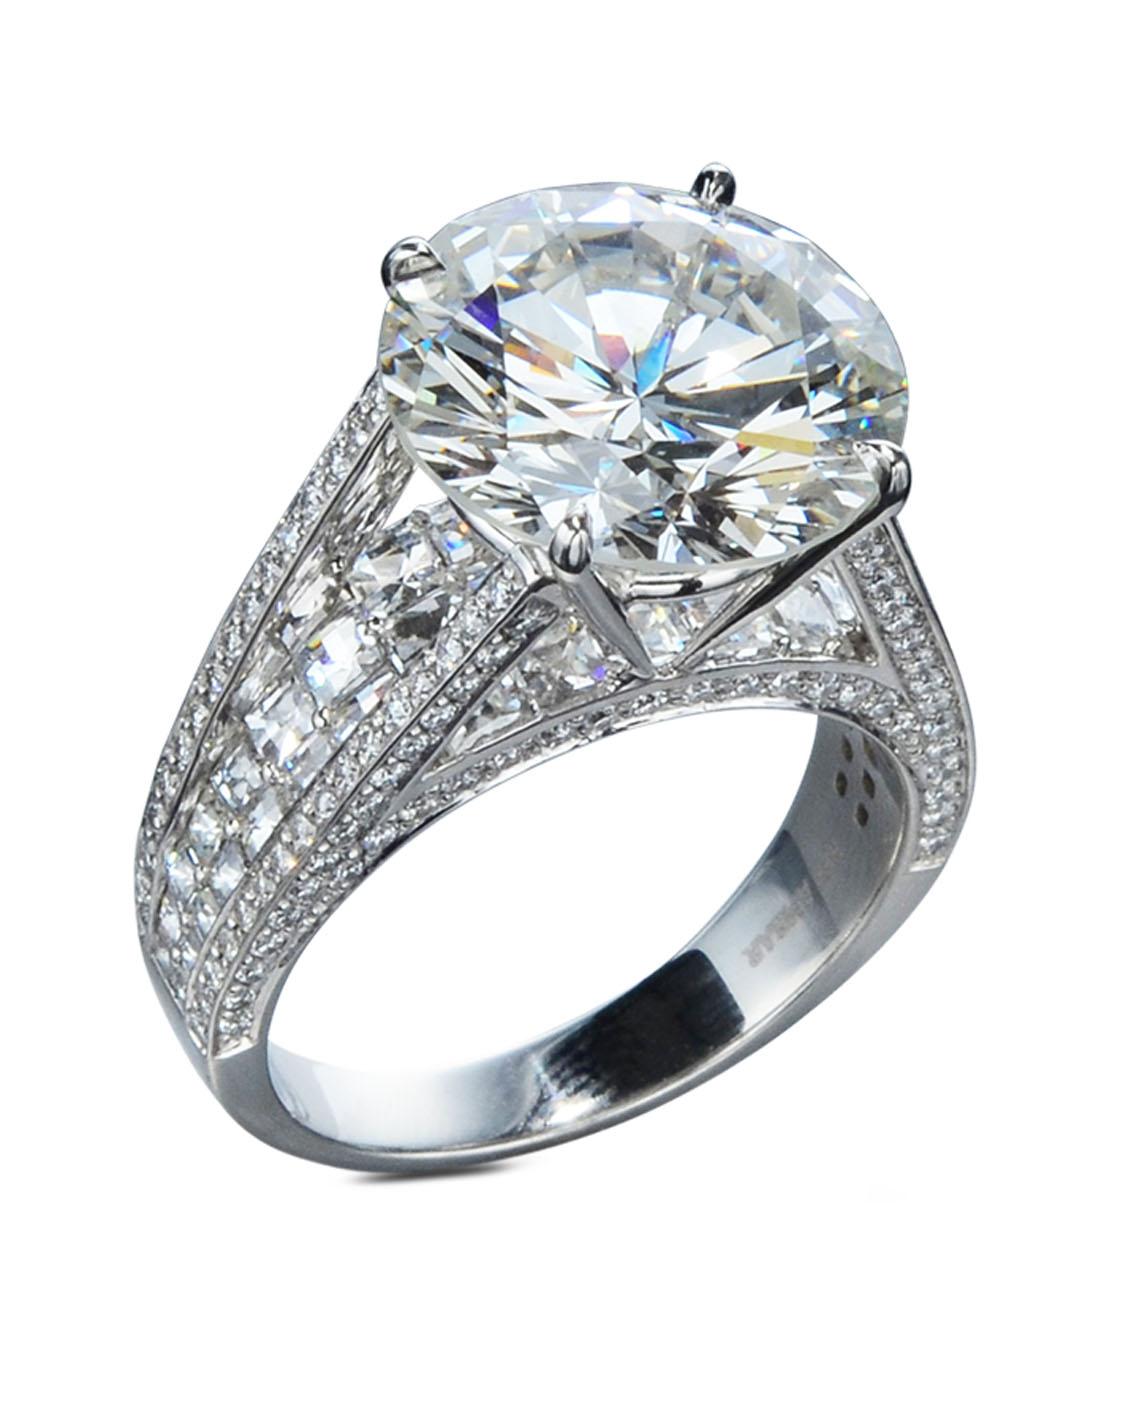 Diamond Wedding Rings.7 Carat Diamond Engagement Ring